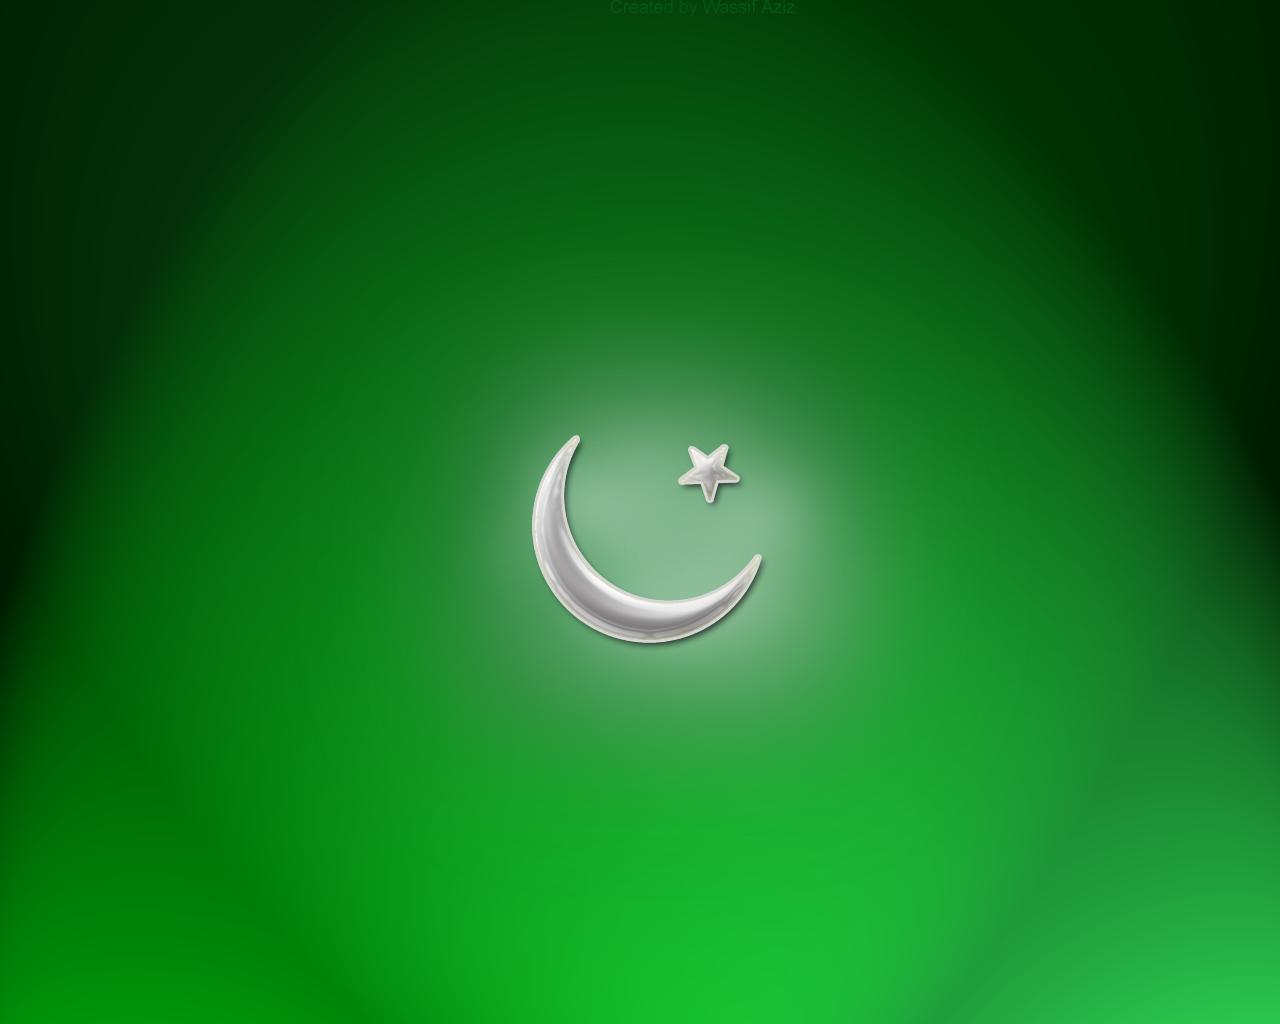 50+] Pakistani Flag HD Wallpaper on ...